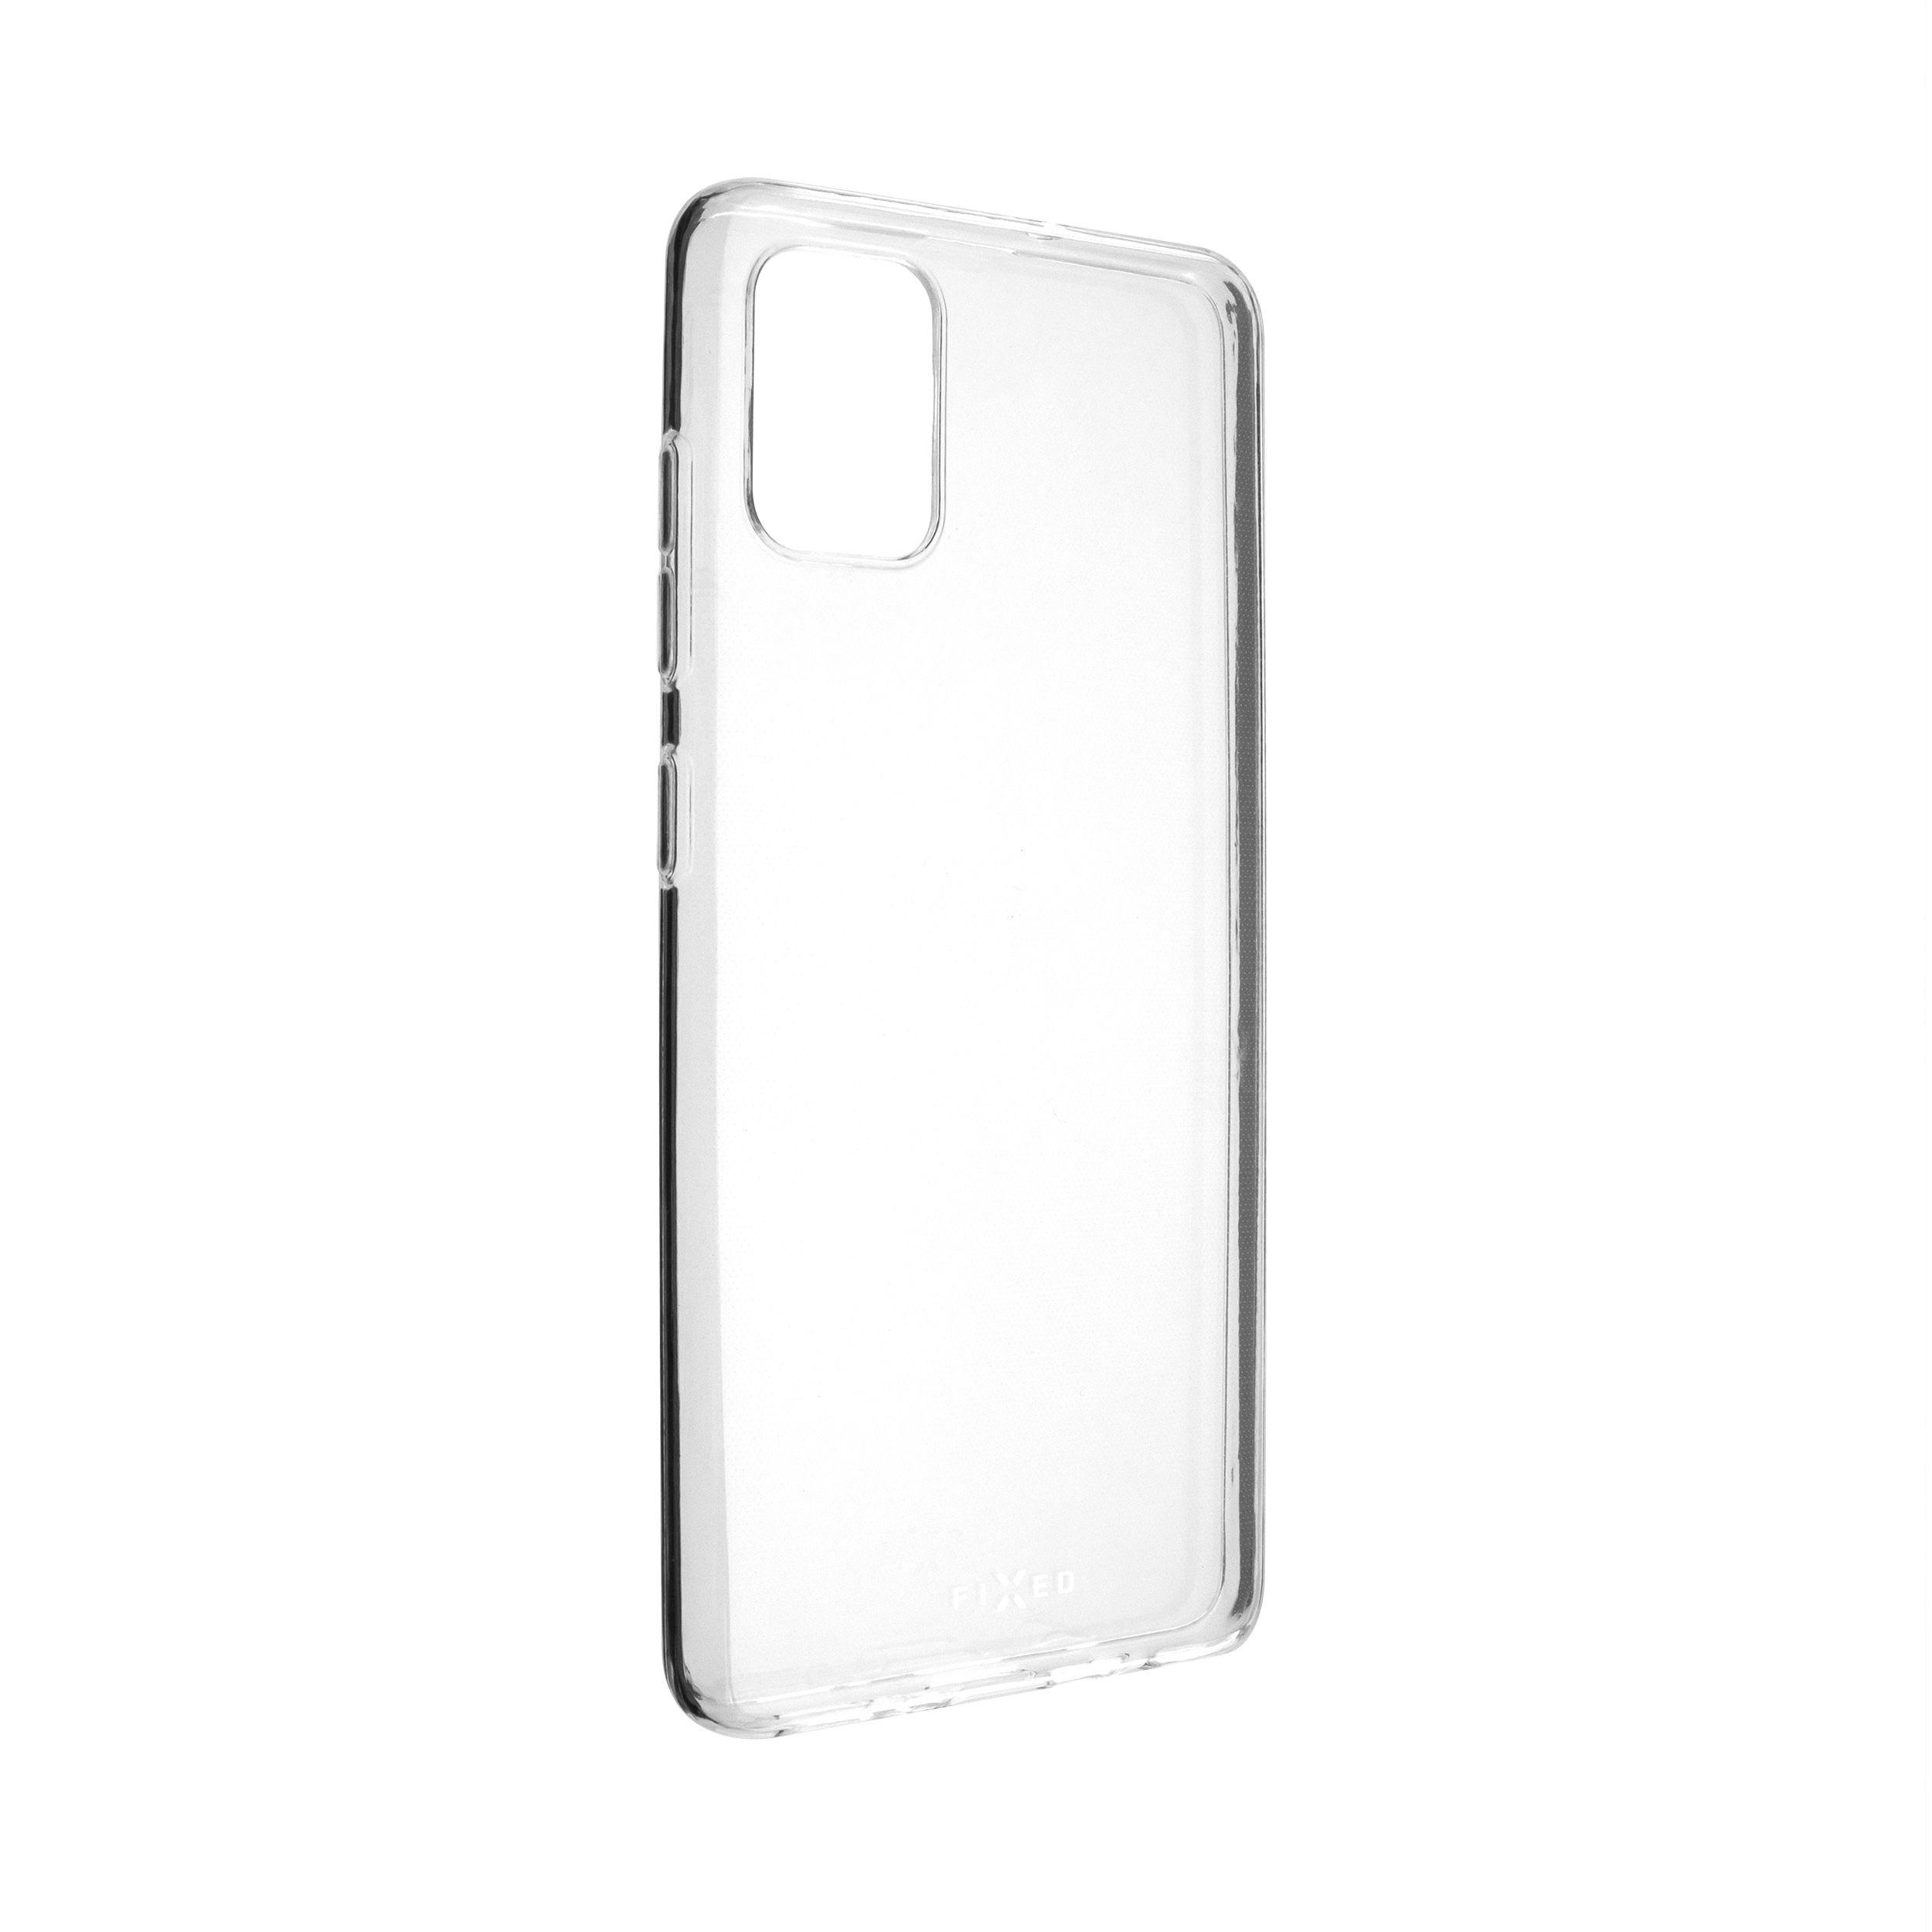 Ultratenké TPU gelové pouzdro FIXED Skin pro Samsung Galaxy A51, 0,6 mm, čiré